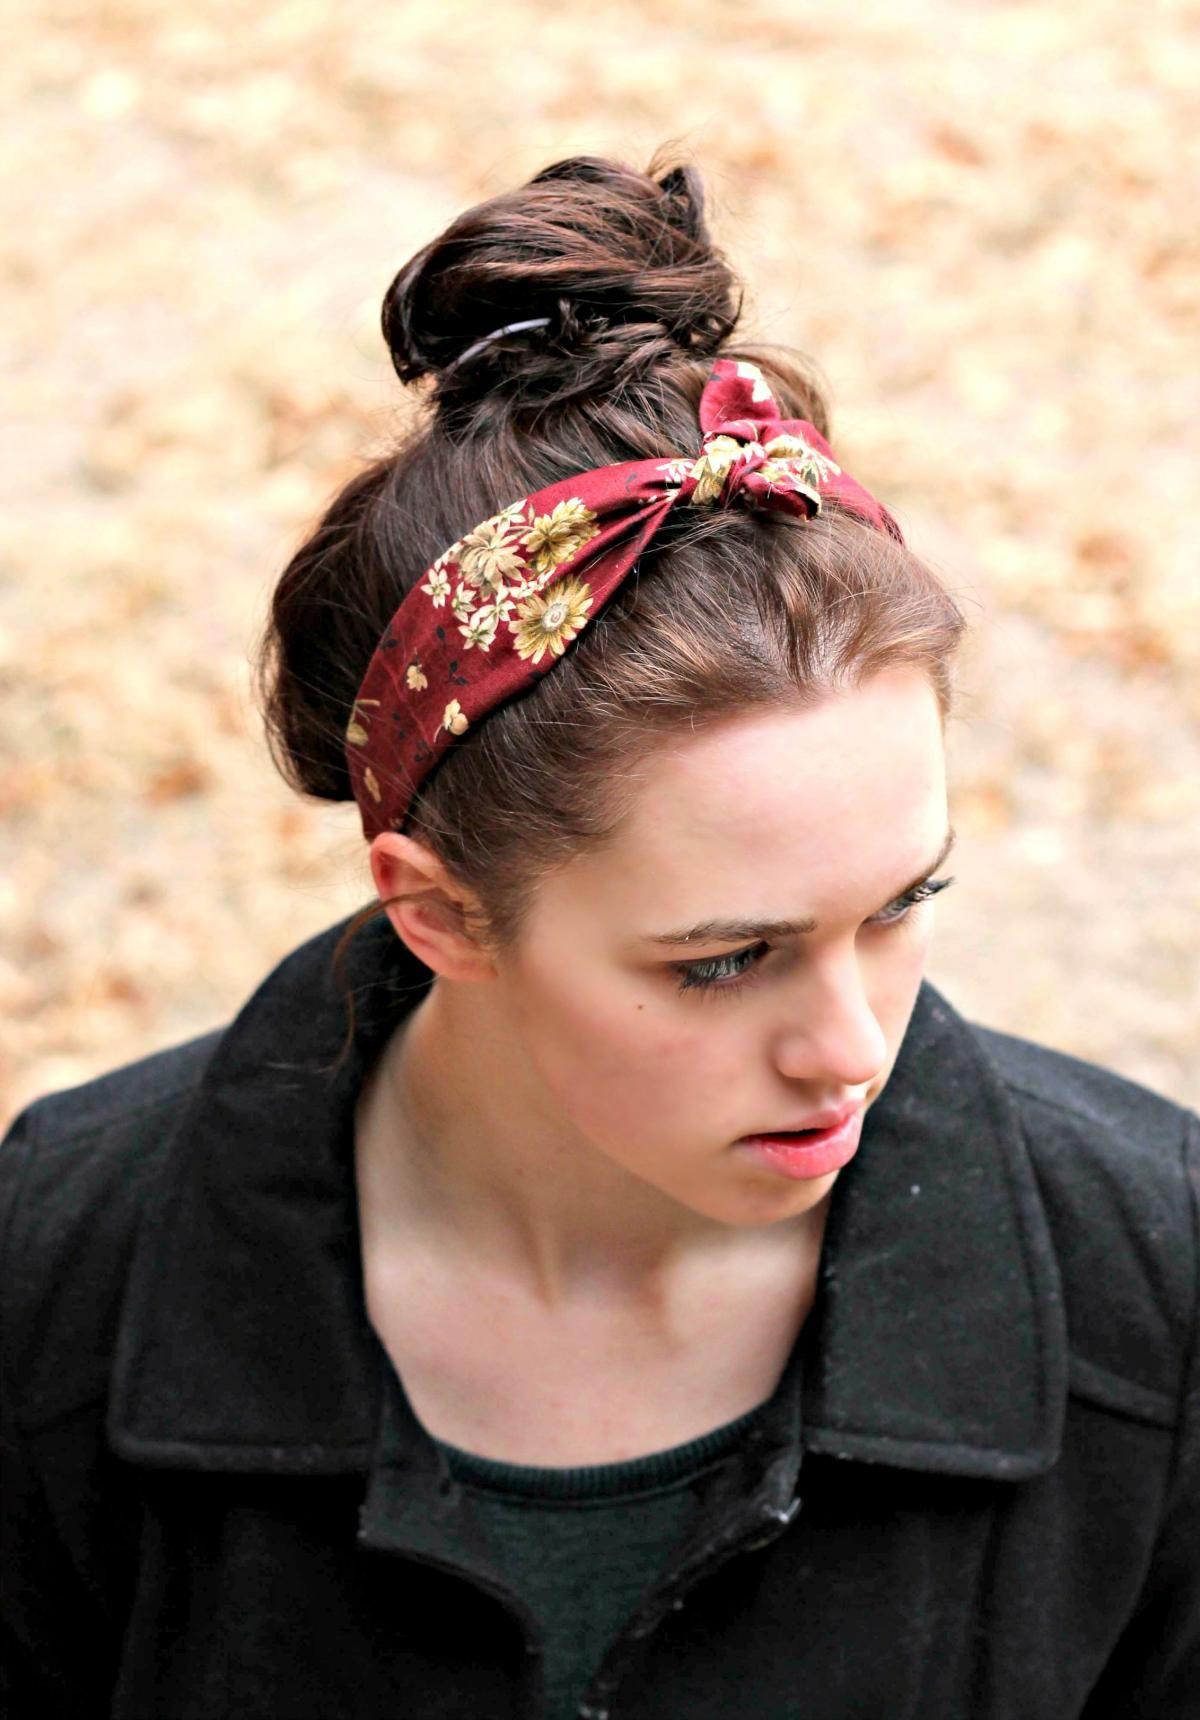 Super Cute Vintage Look Tie Headband Tie In Women S